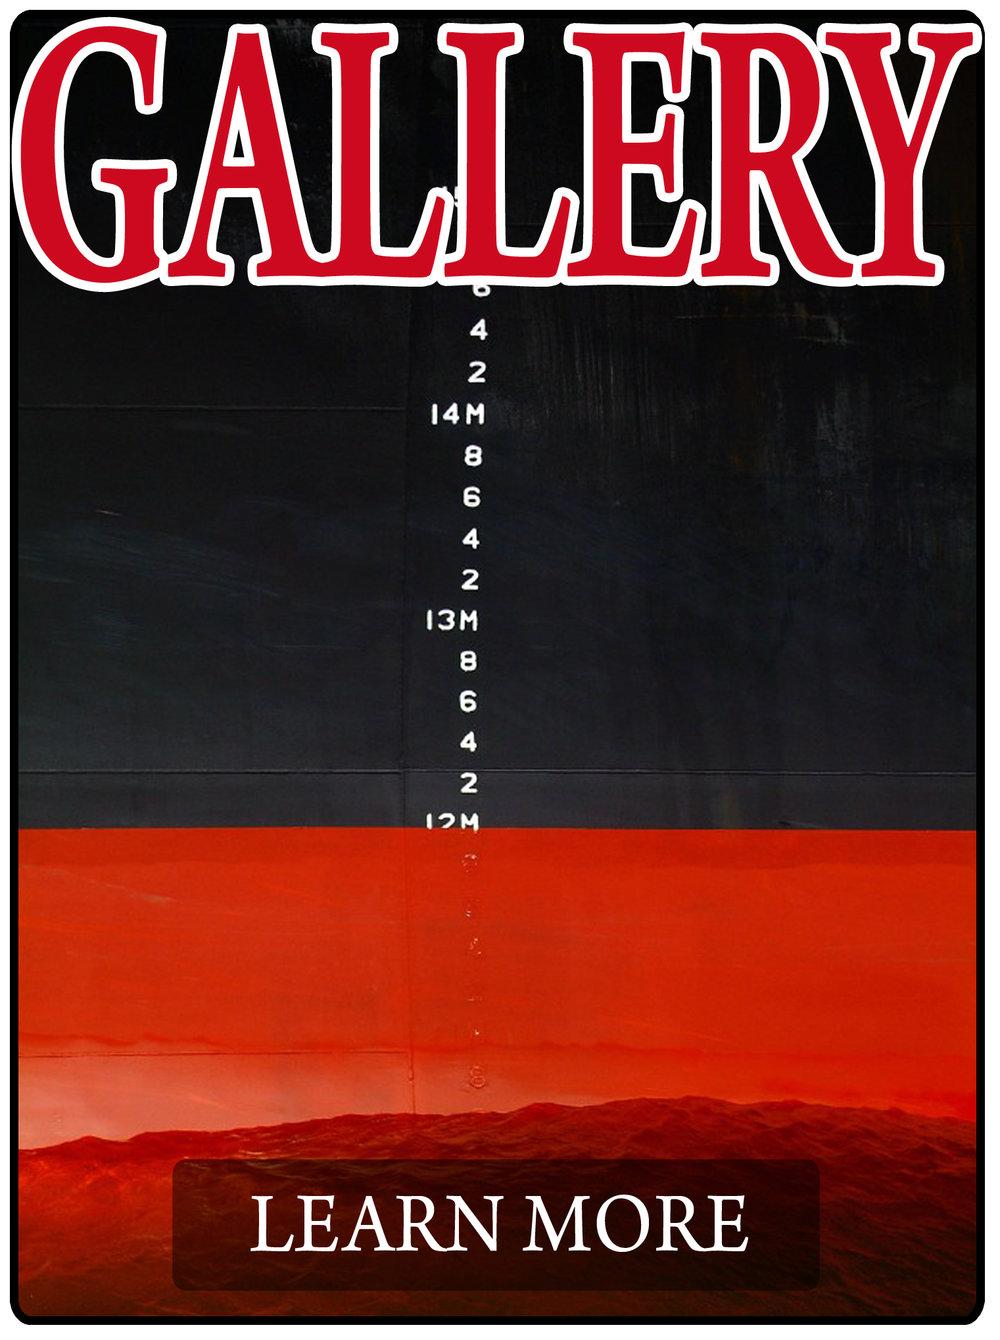 GALLERY - BG.jpg